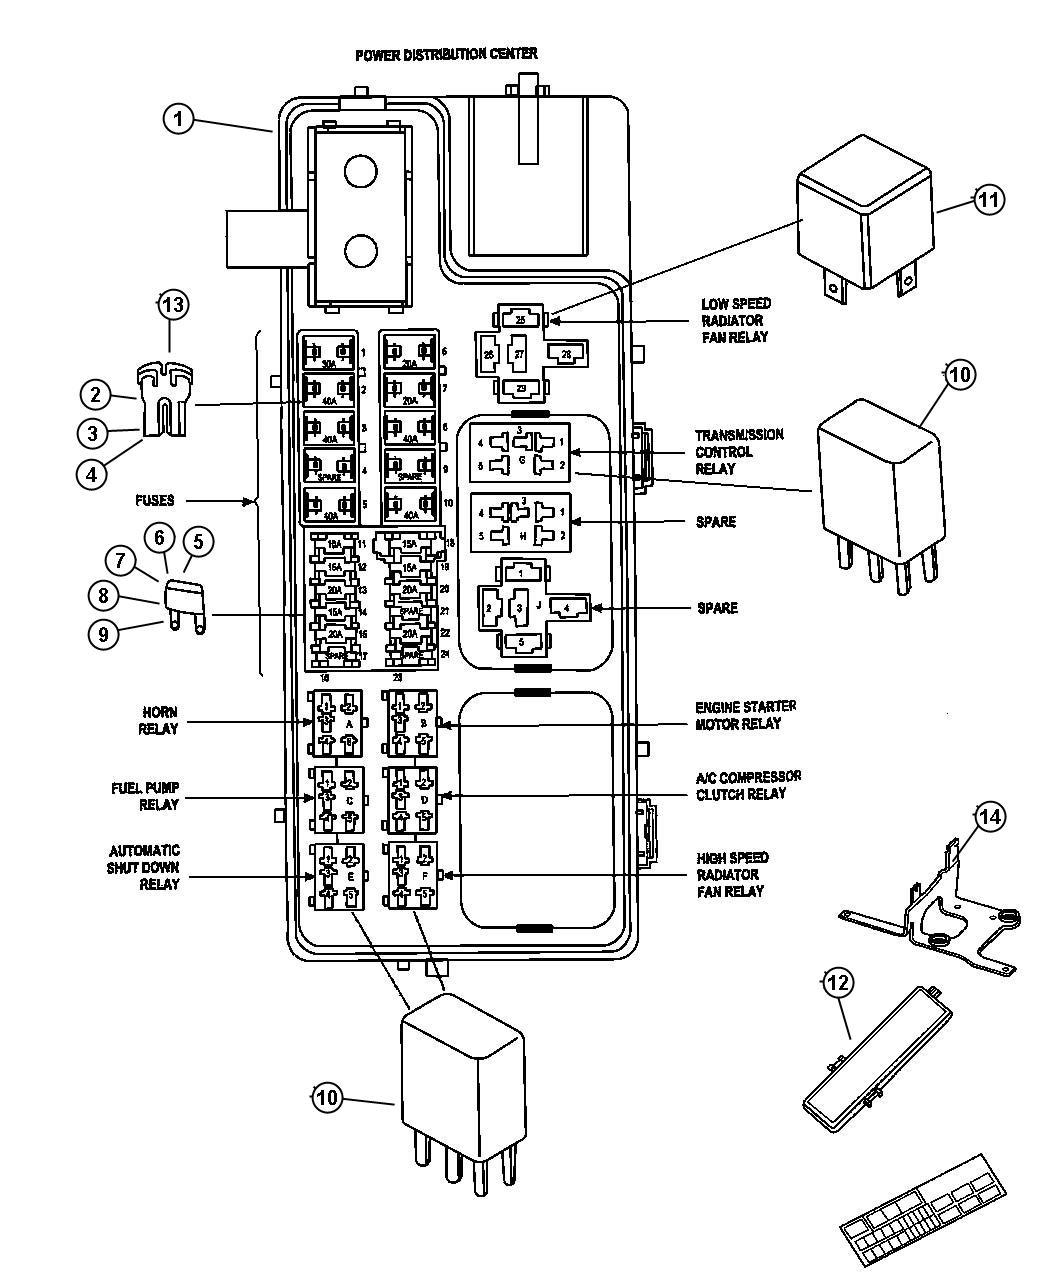 Jeep Relay Mini Radiator Fan